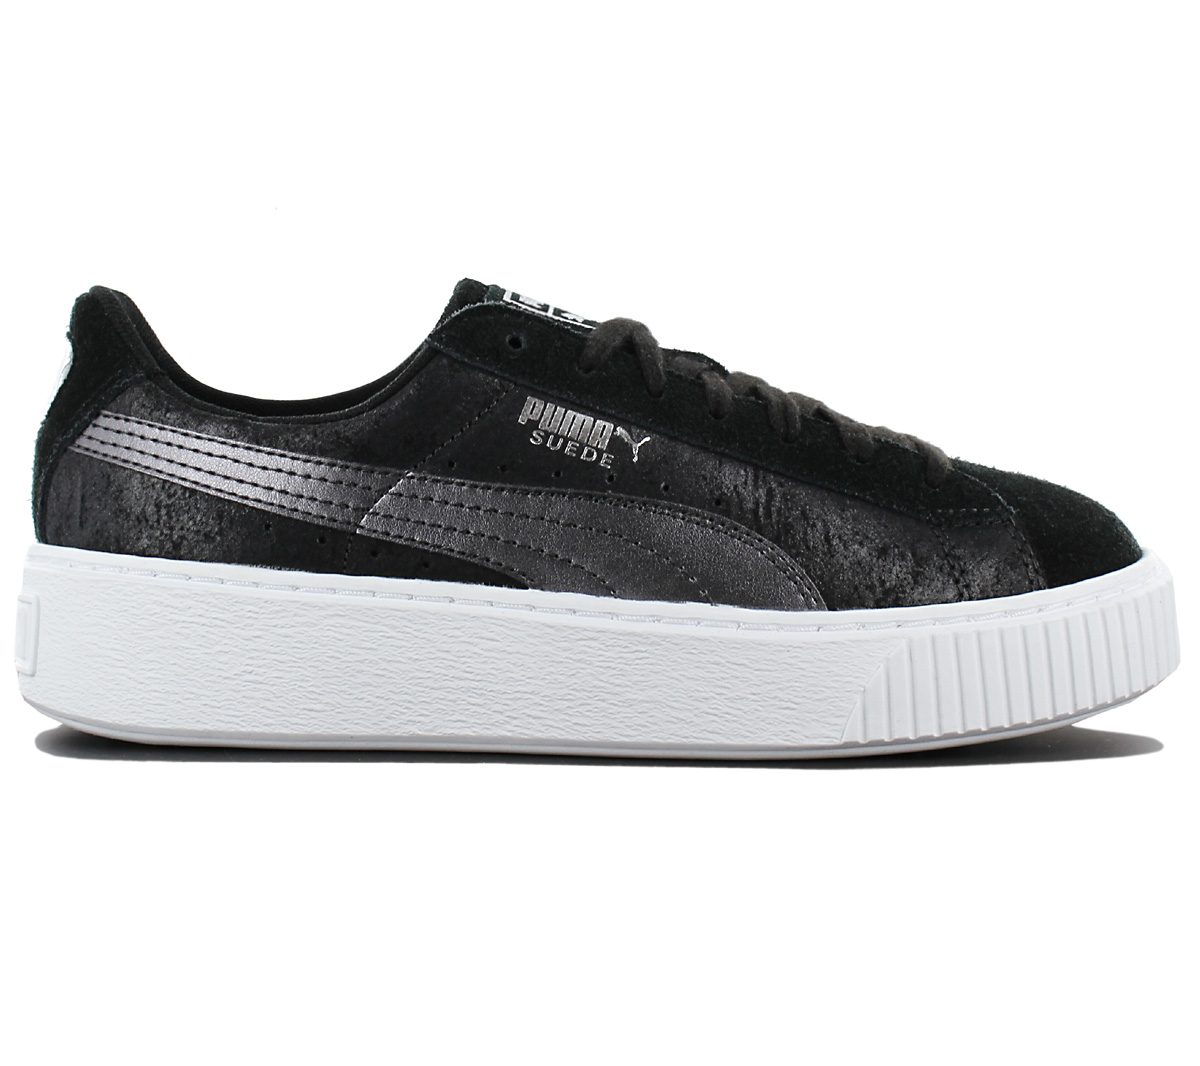 Puma Suede Platform Safari Wns Black White Women Casual Shoes Sneakers 364594 03